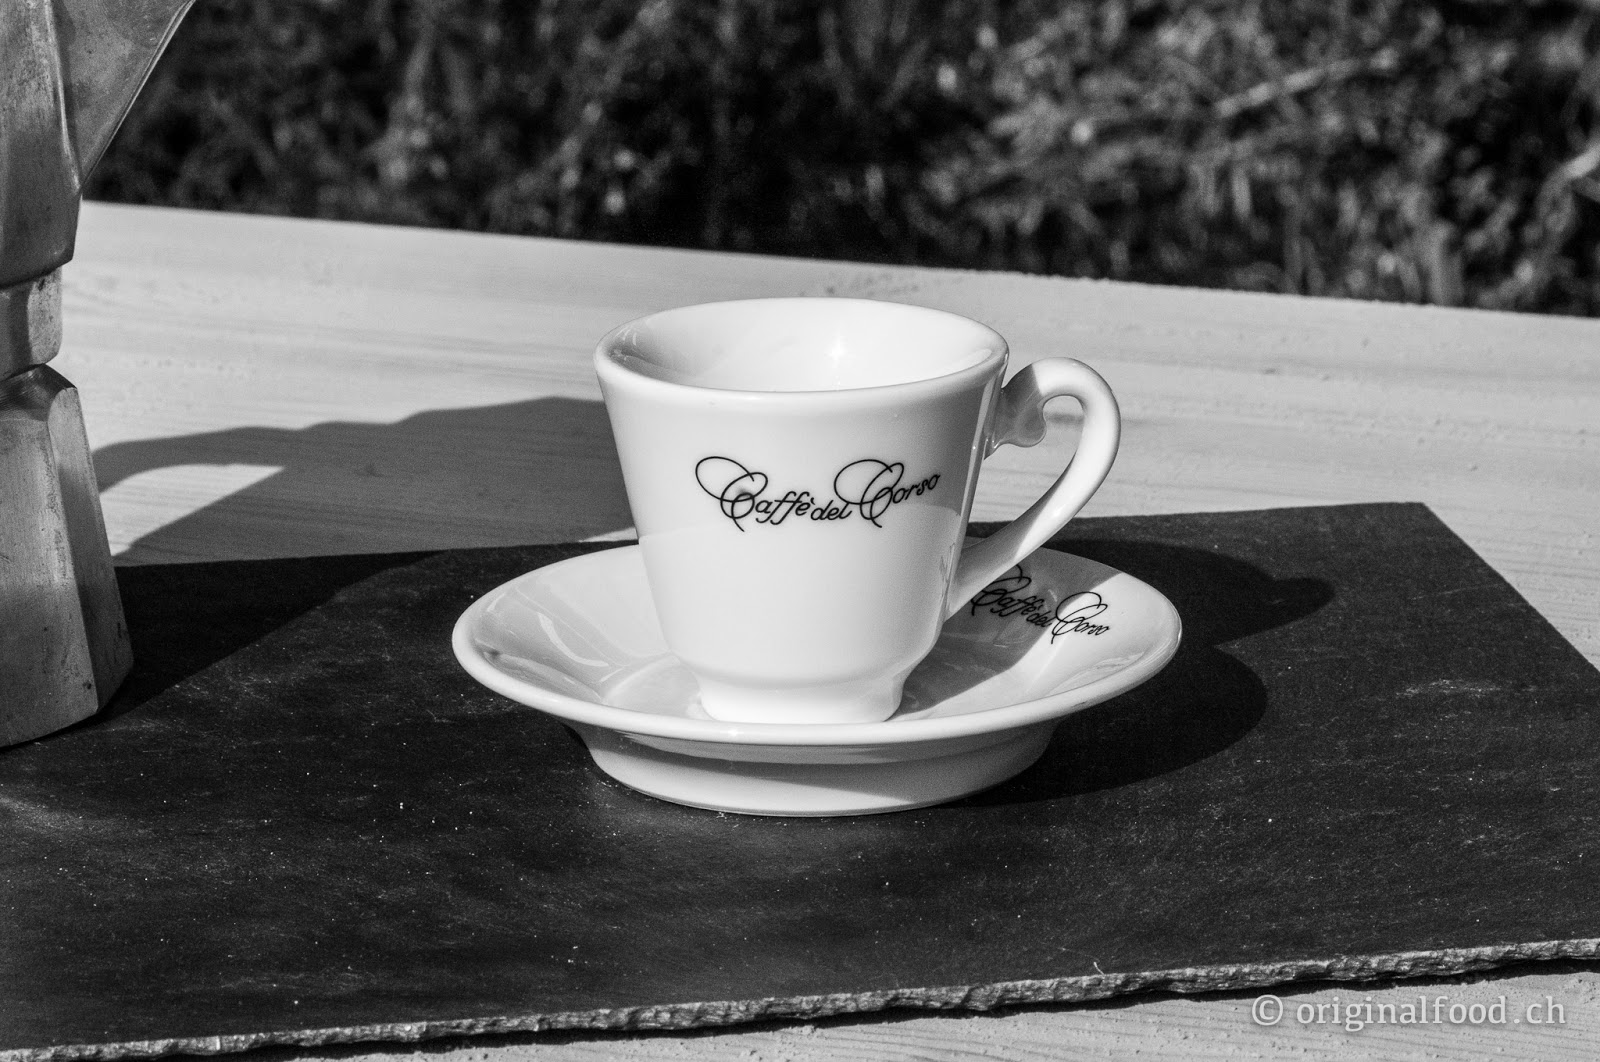 kaffa wildkaffee caf sauvage kaffee in seiner. Black Bedroom Furniture Sets. Home Design Ideas